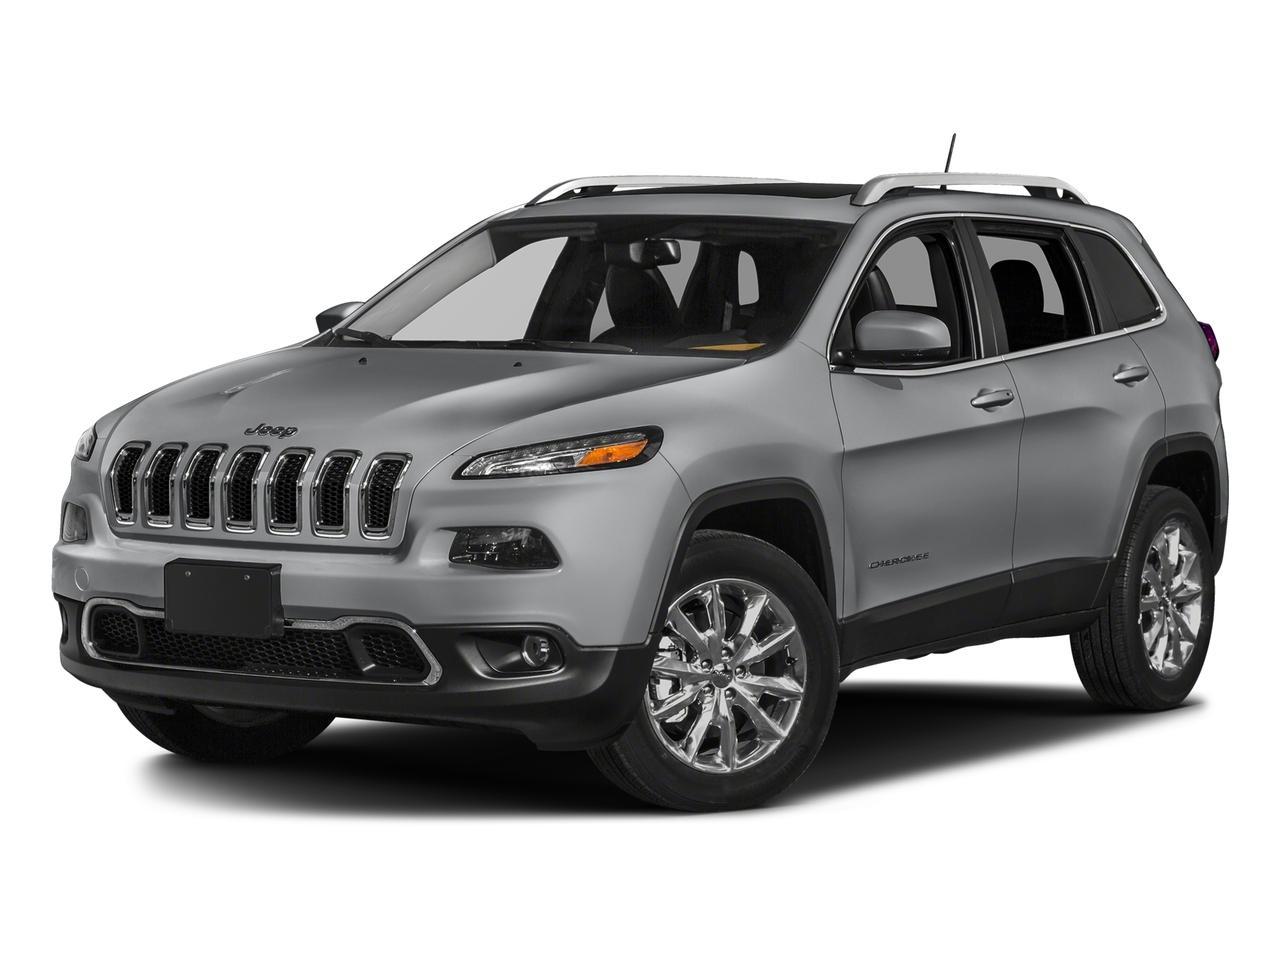 2018 Jeep Cherokee Vehicle Photo in Shreveport, LA 71105